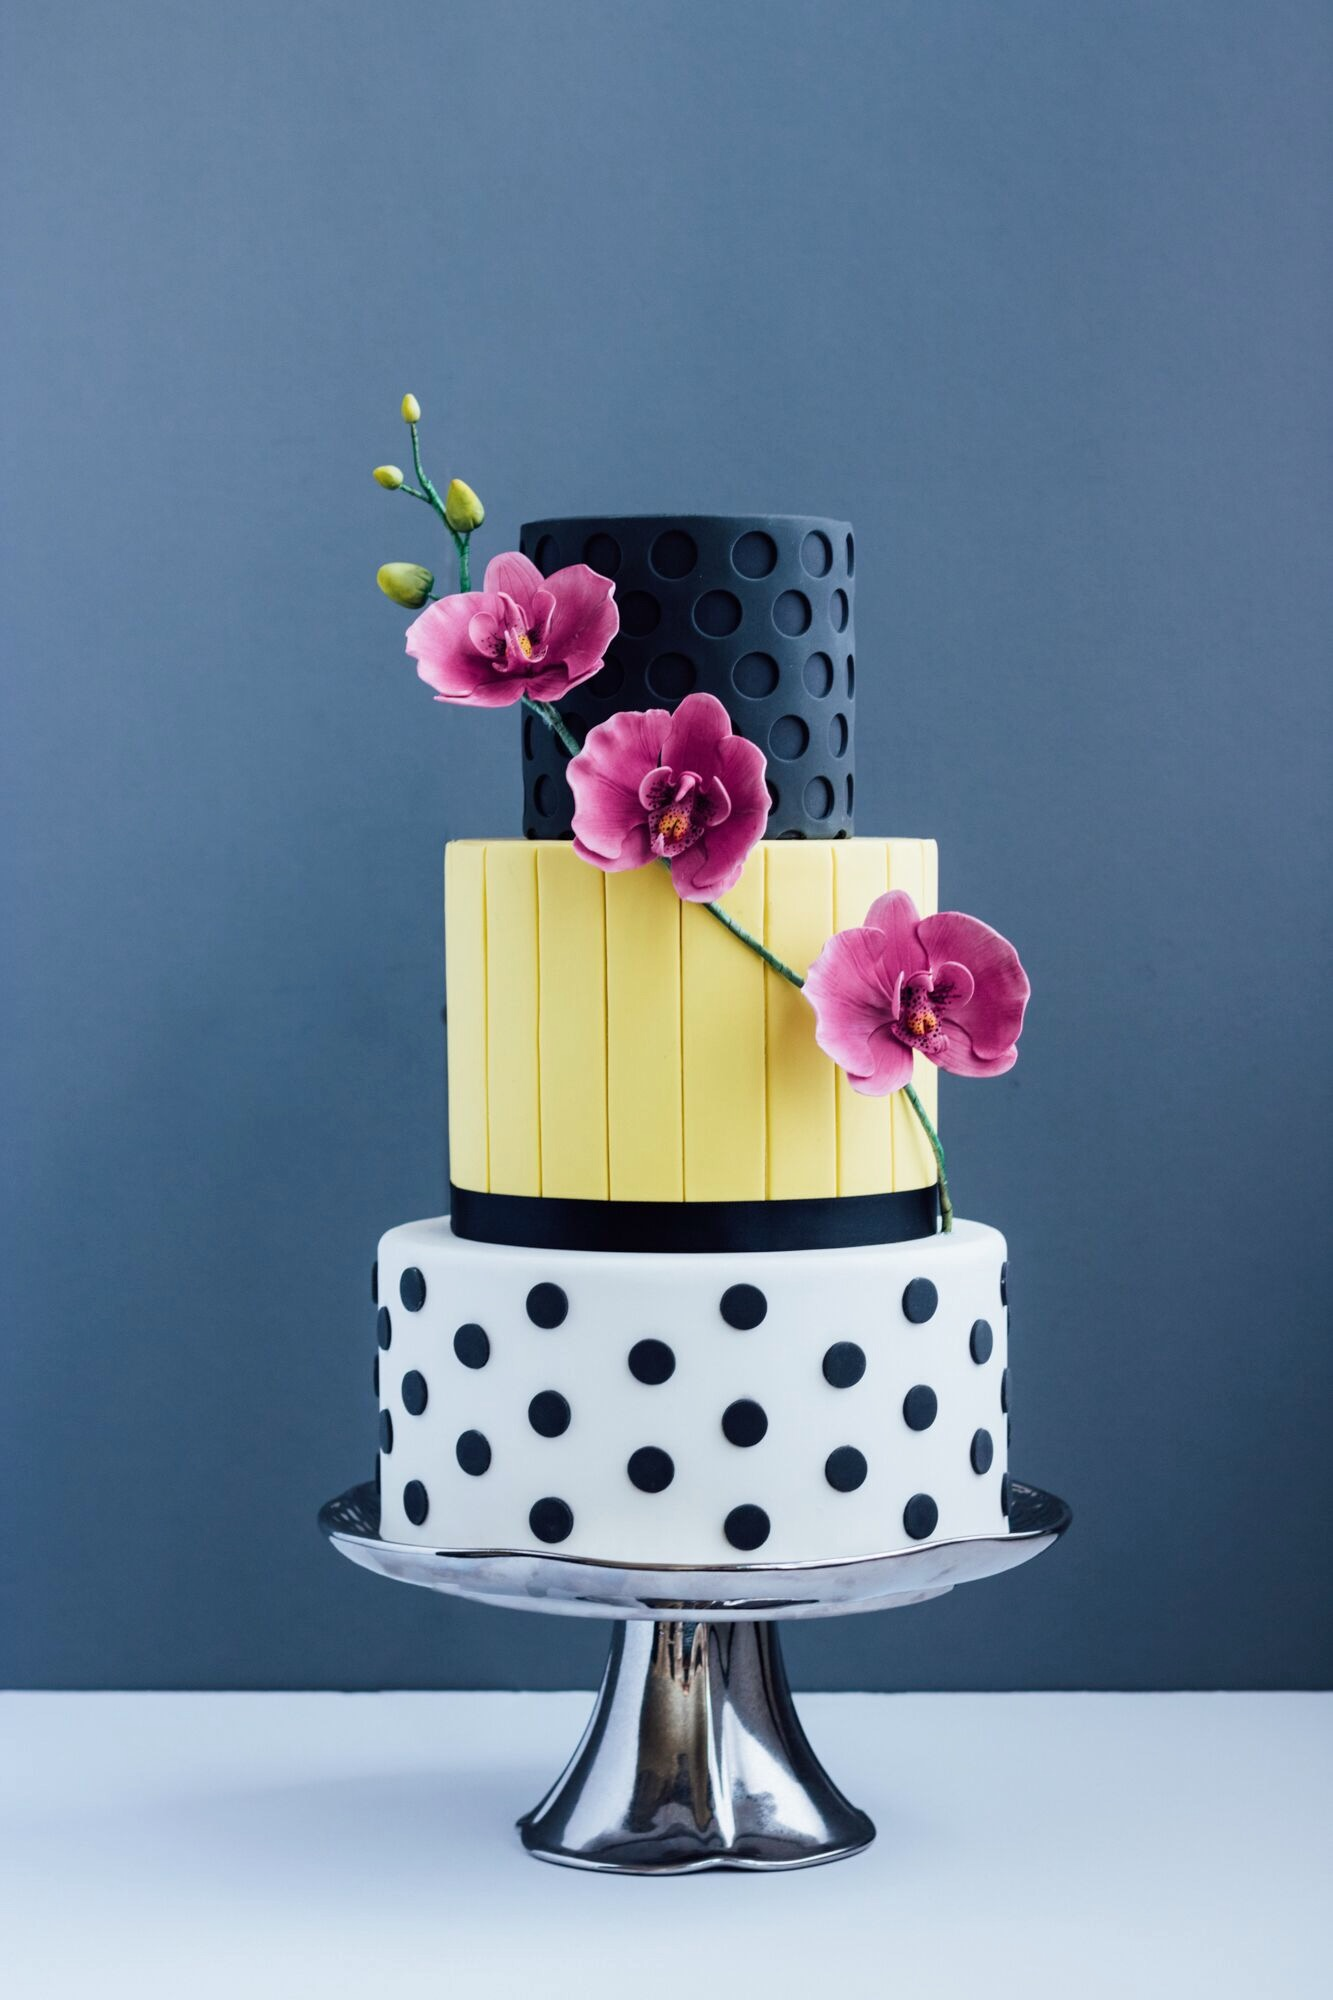 Black and white polka dot wedding cake with pastel yellow